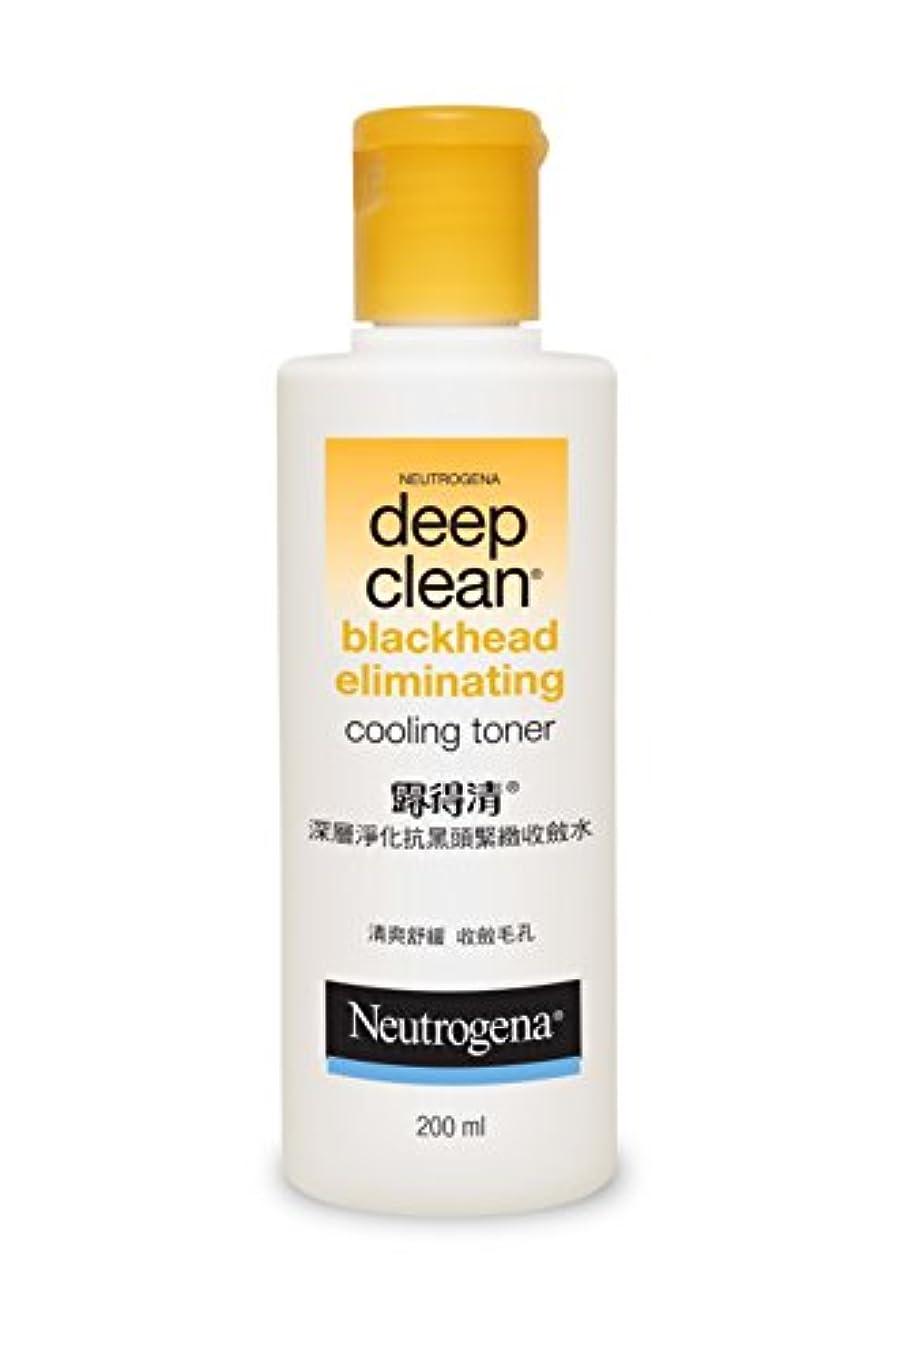 Neutrogena Deep Clean Blackhead Eliminating Cooling Toner, 200ml